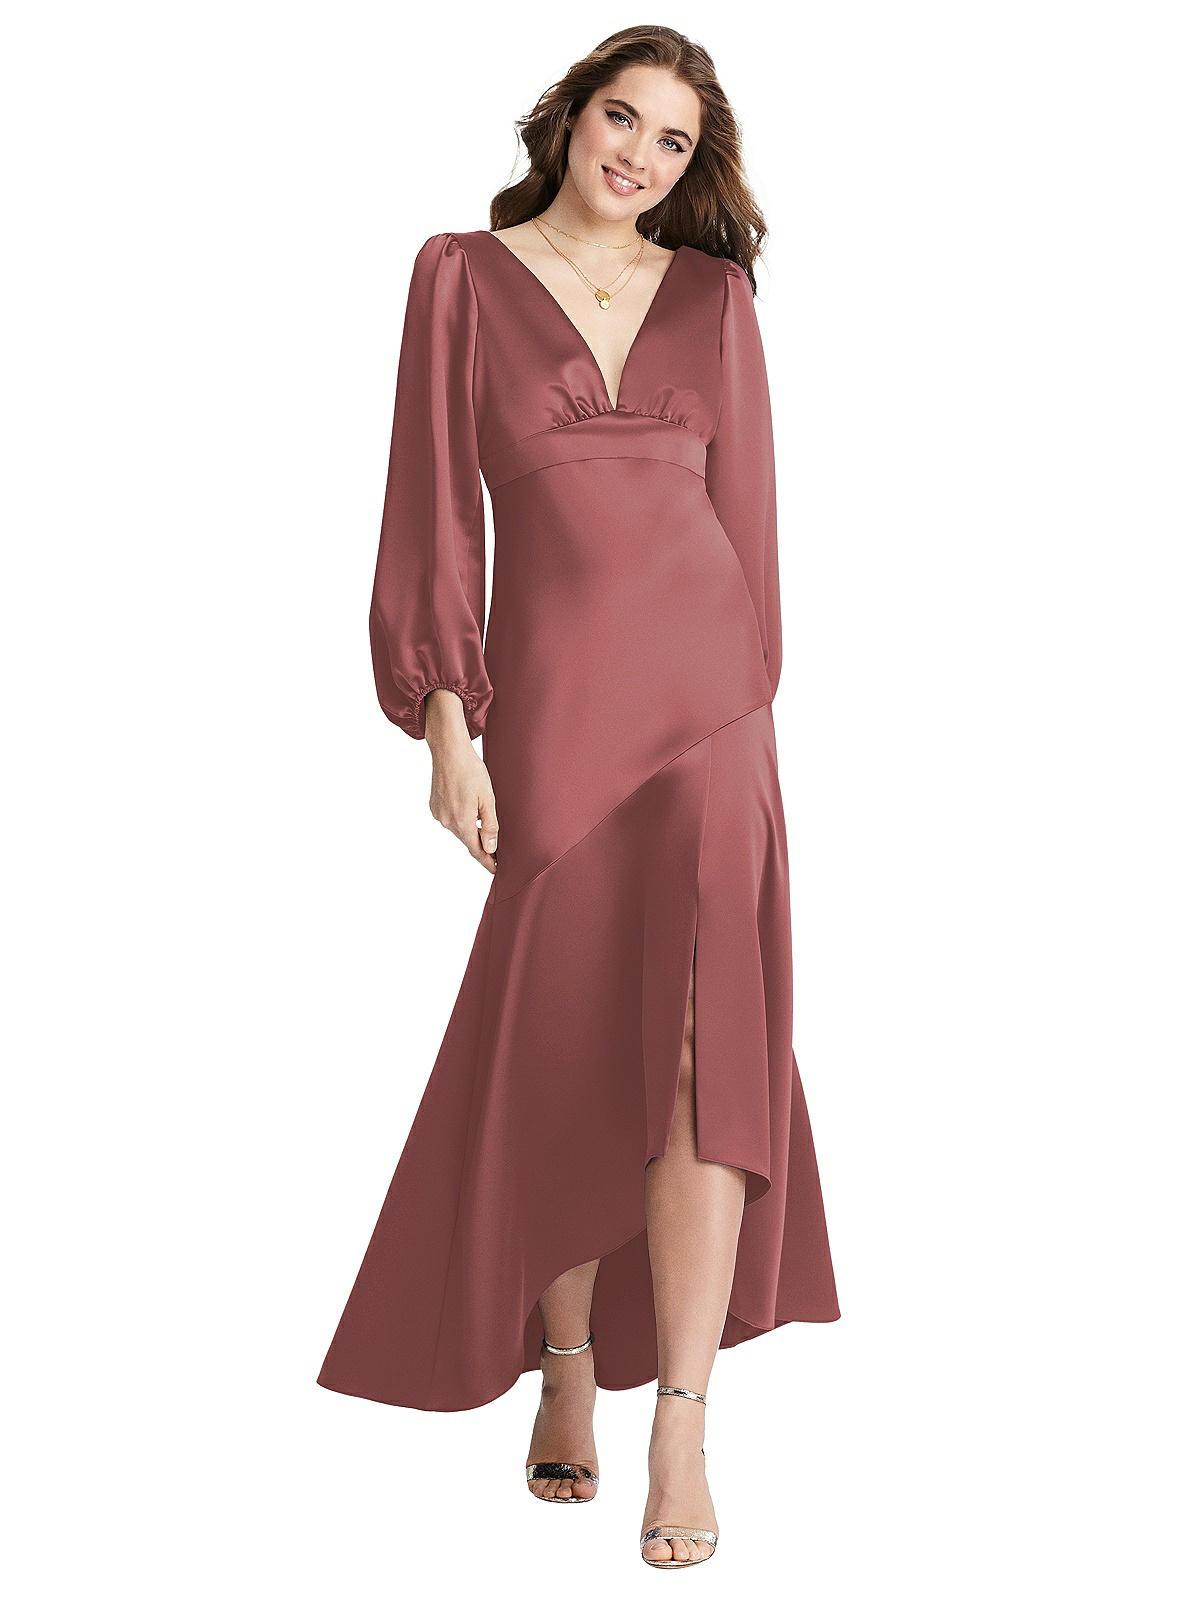 Special Order Puff Sleeve Asymmetrical Drop Waist High-Low Slip Dress - Teagan